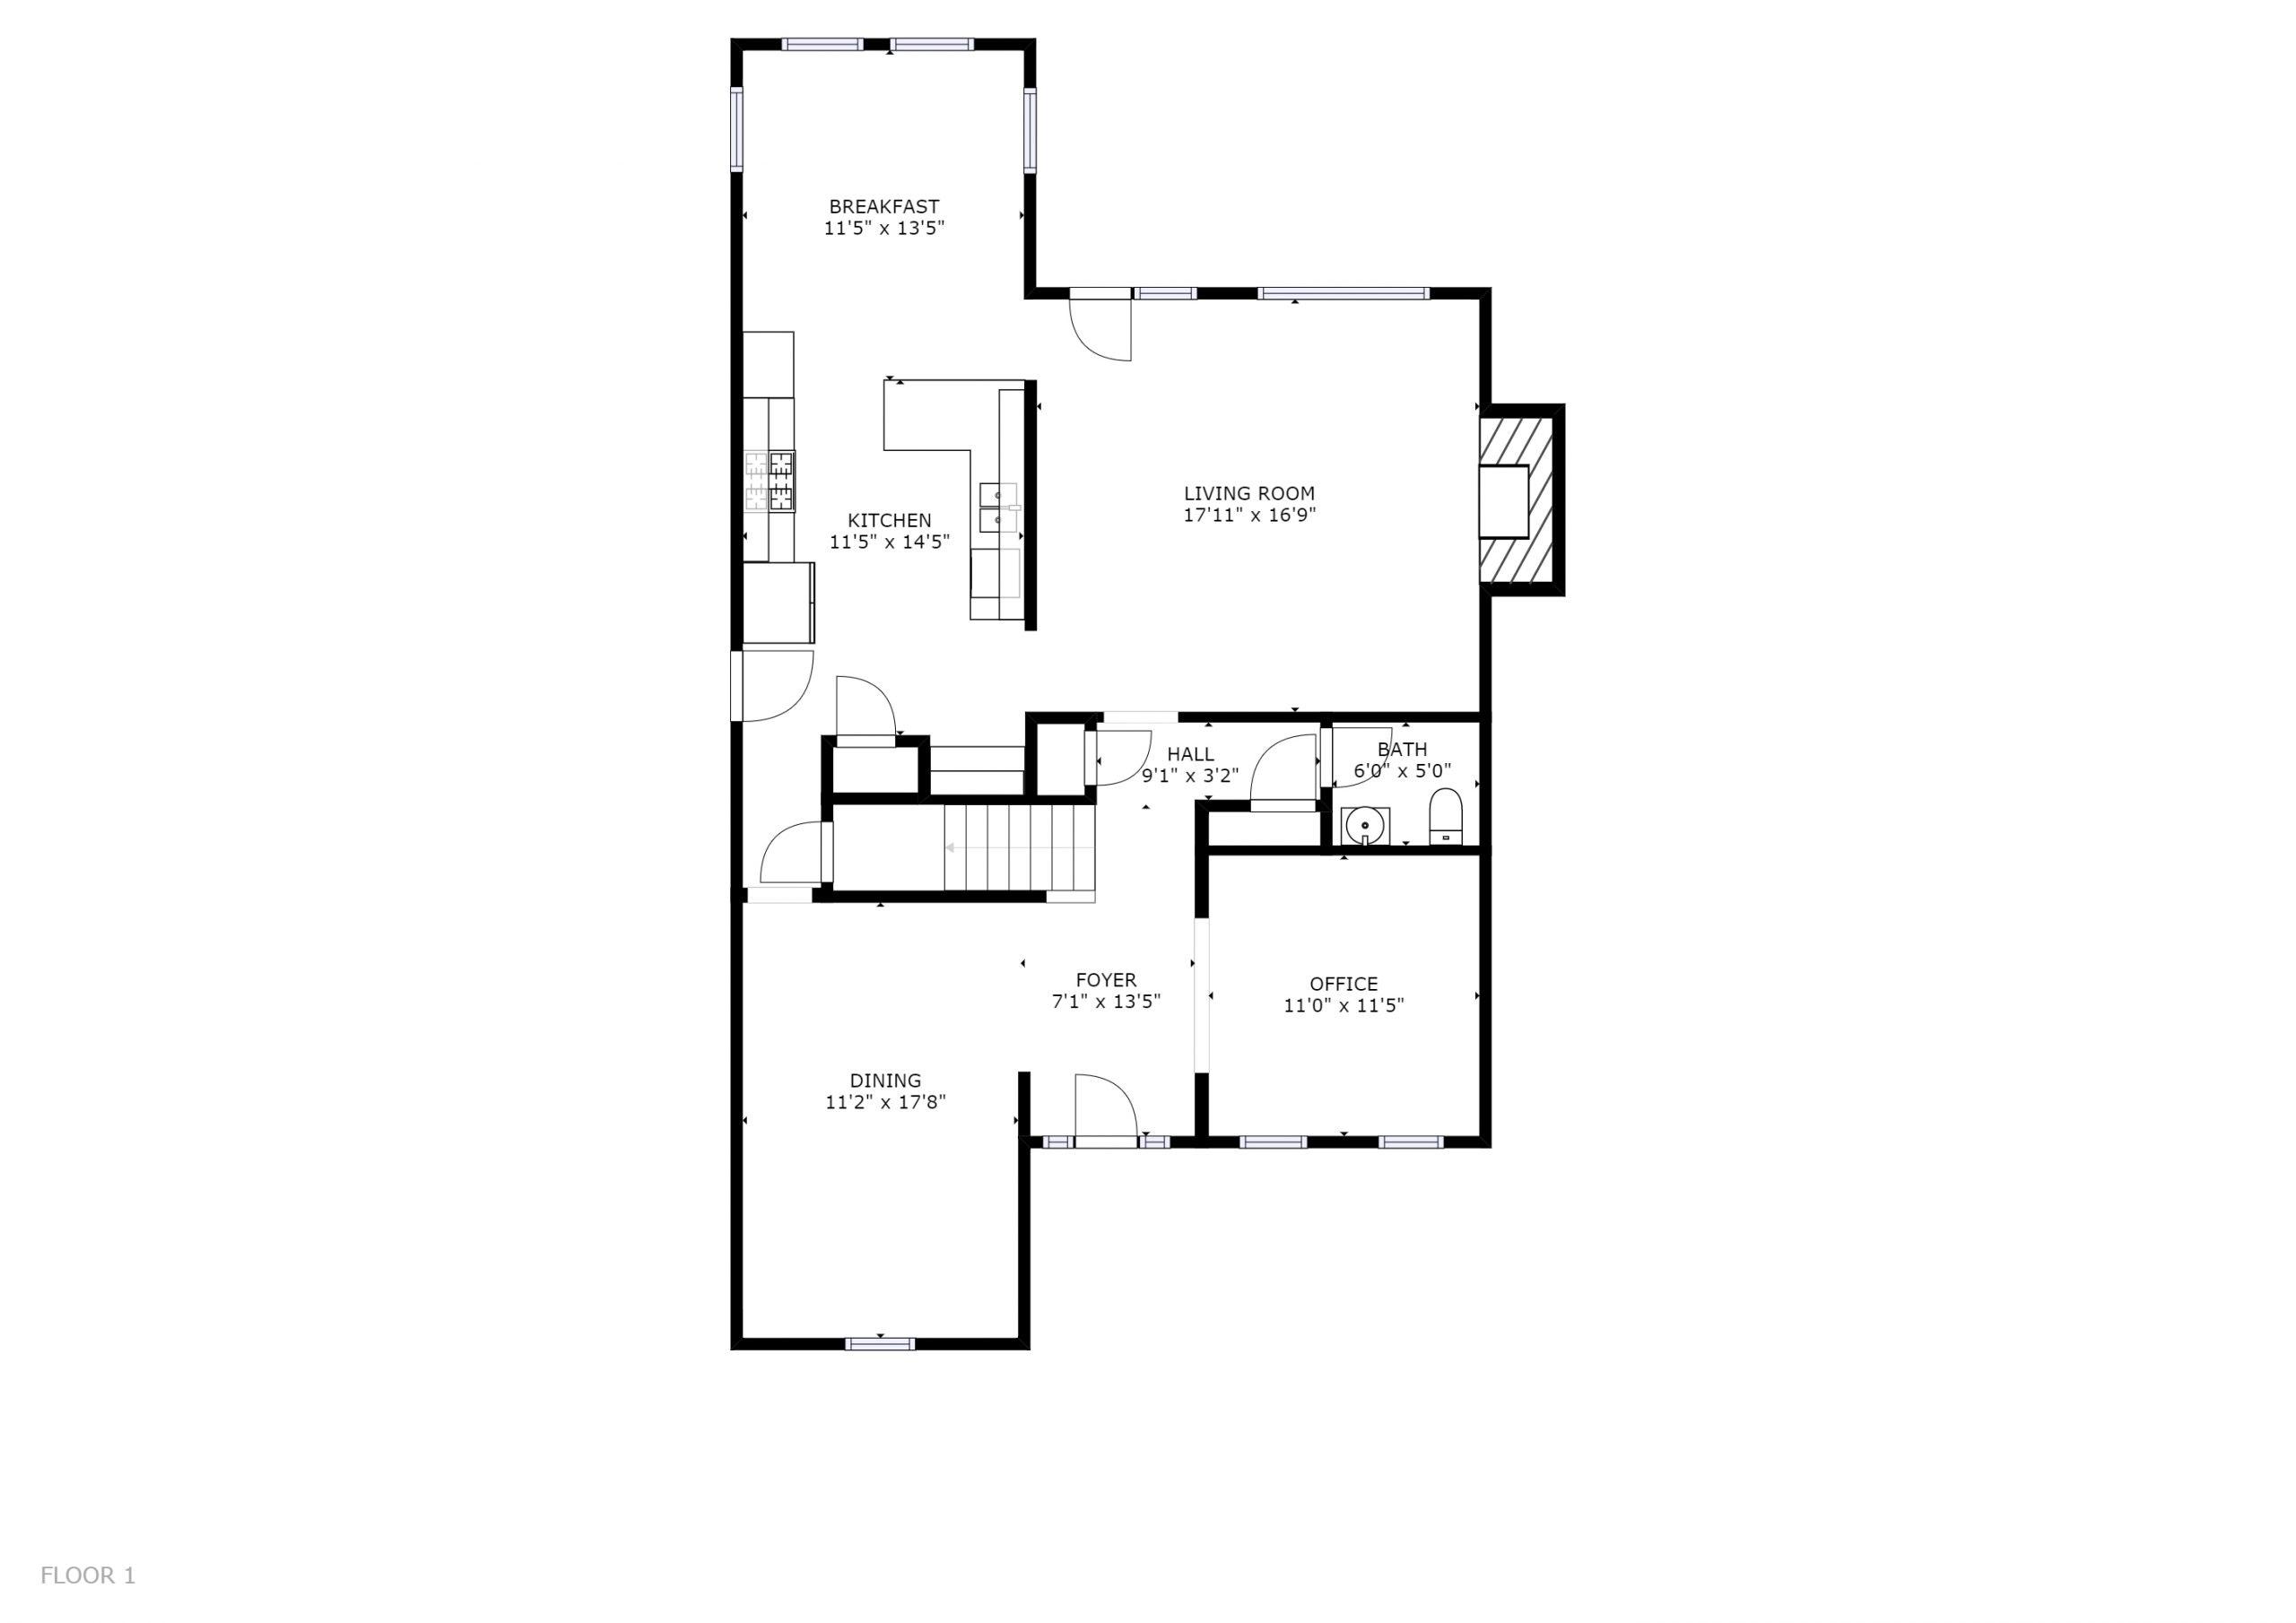 706 BAYSHORE DRIVE KNOXVILLE, TN 37934 - Floor Plan 1